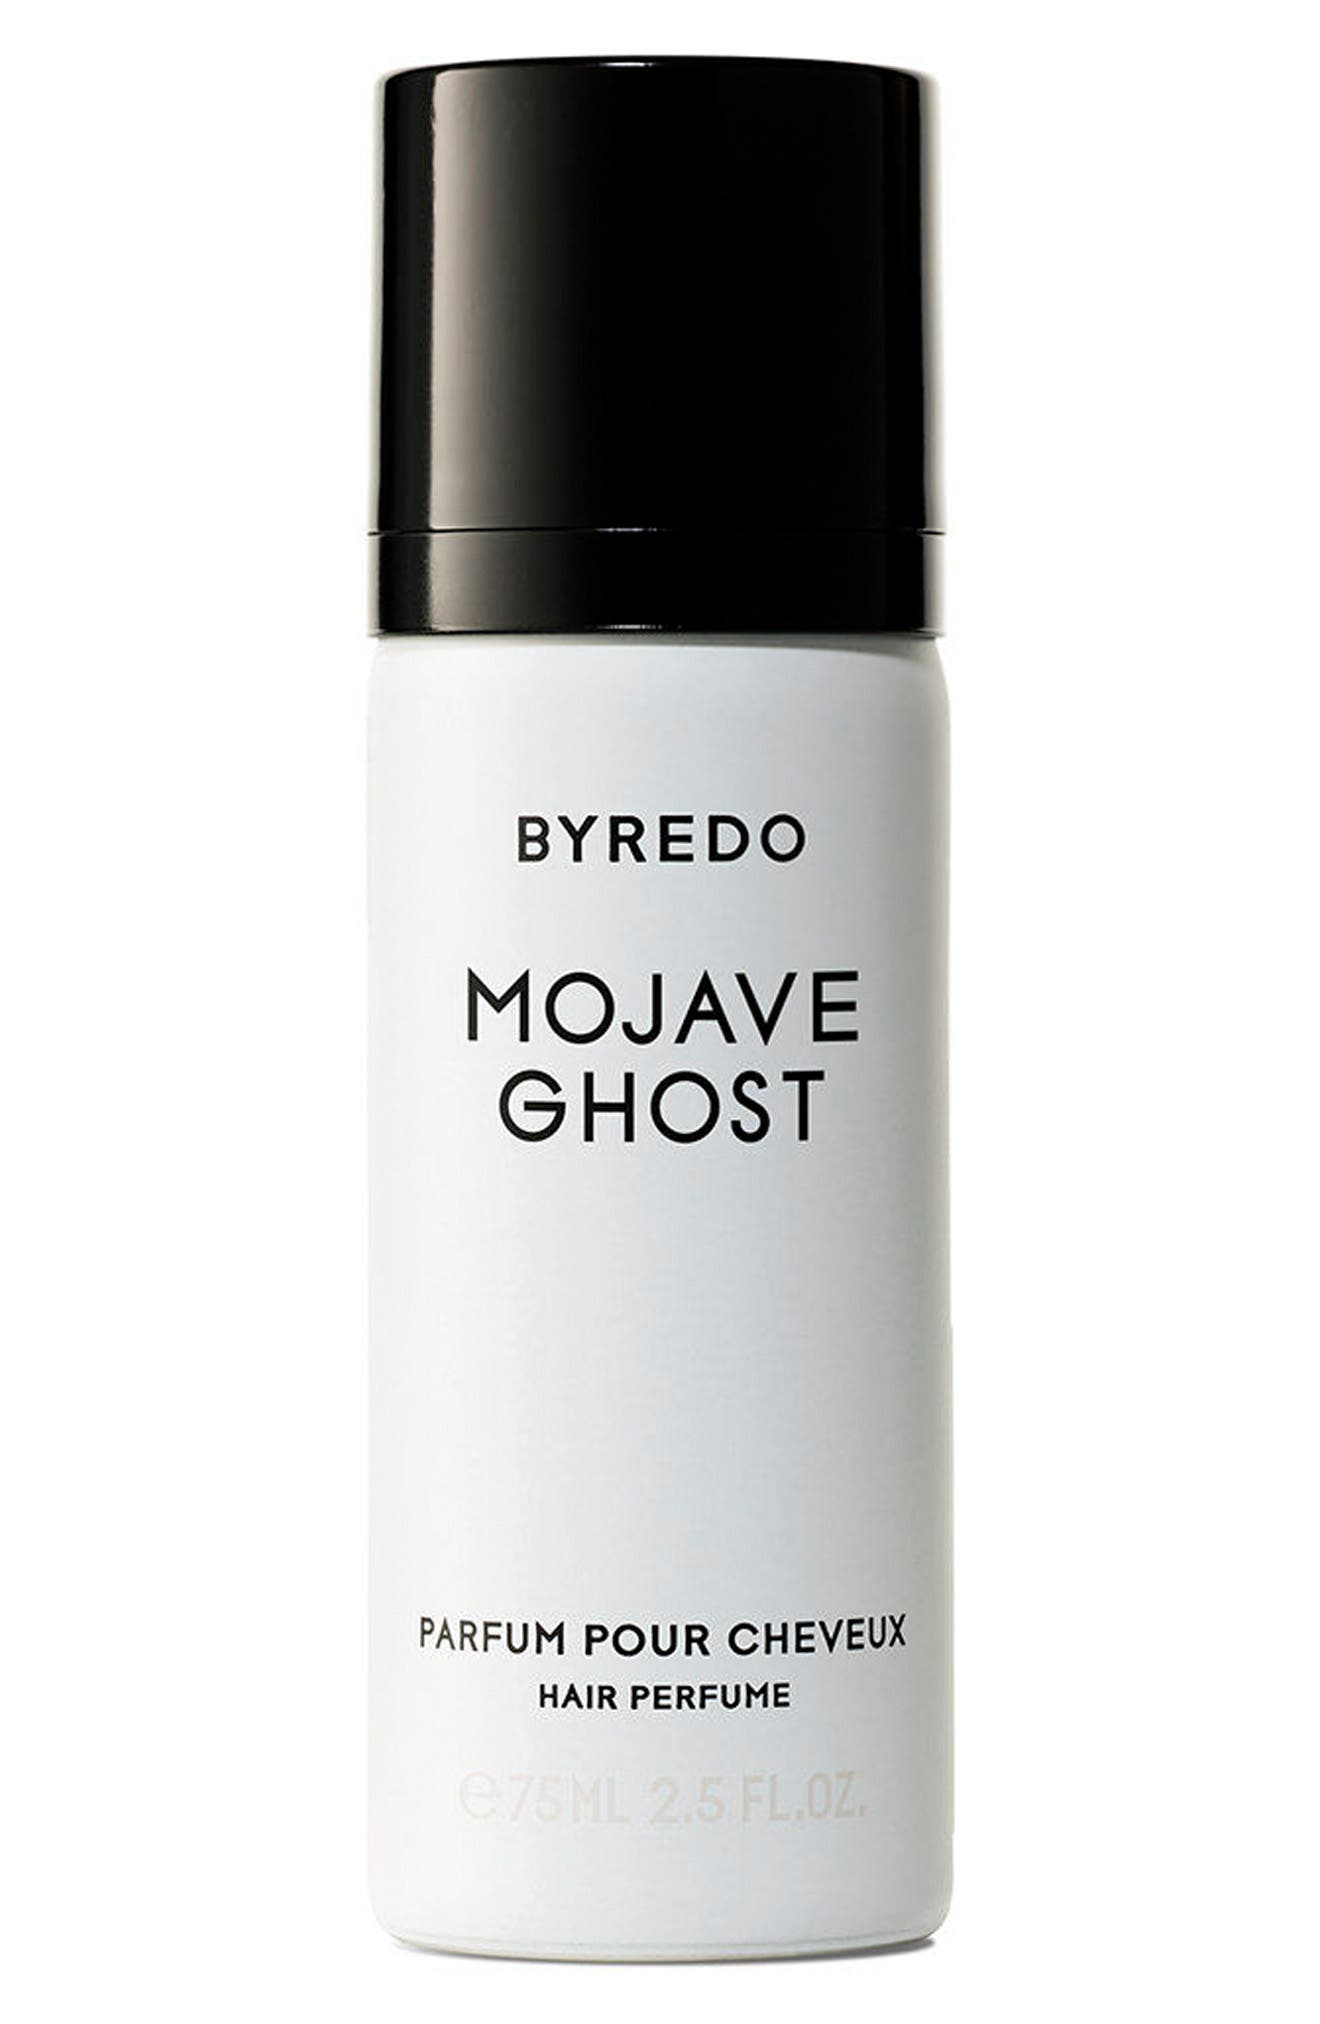 BYREDO Mojave Ghost Hair Perfume